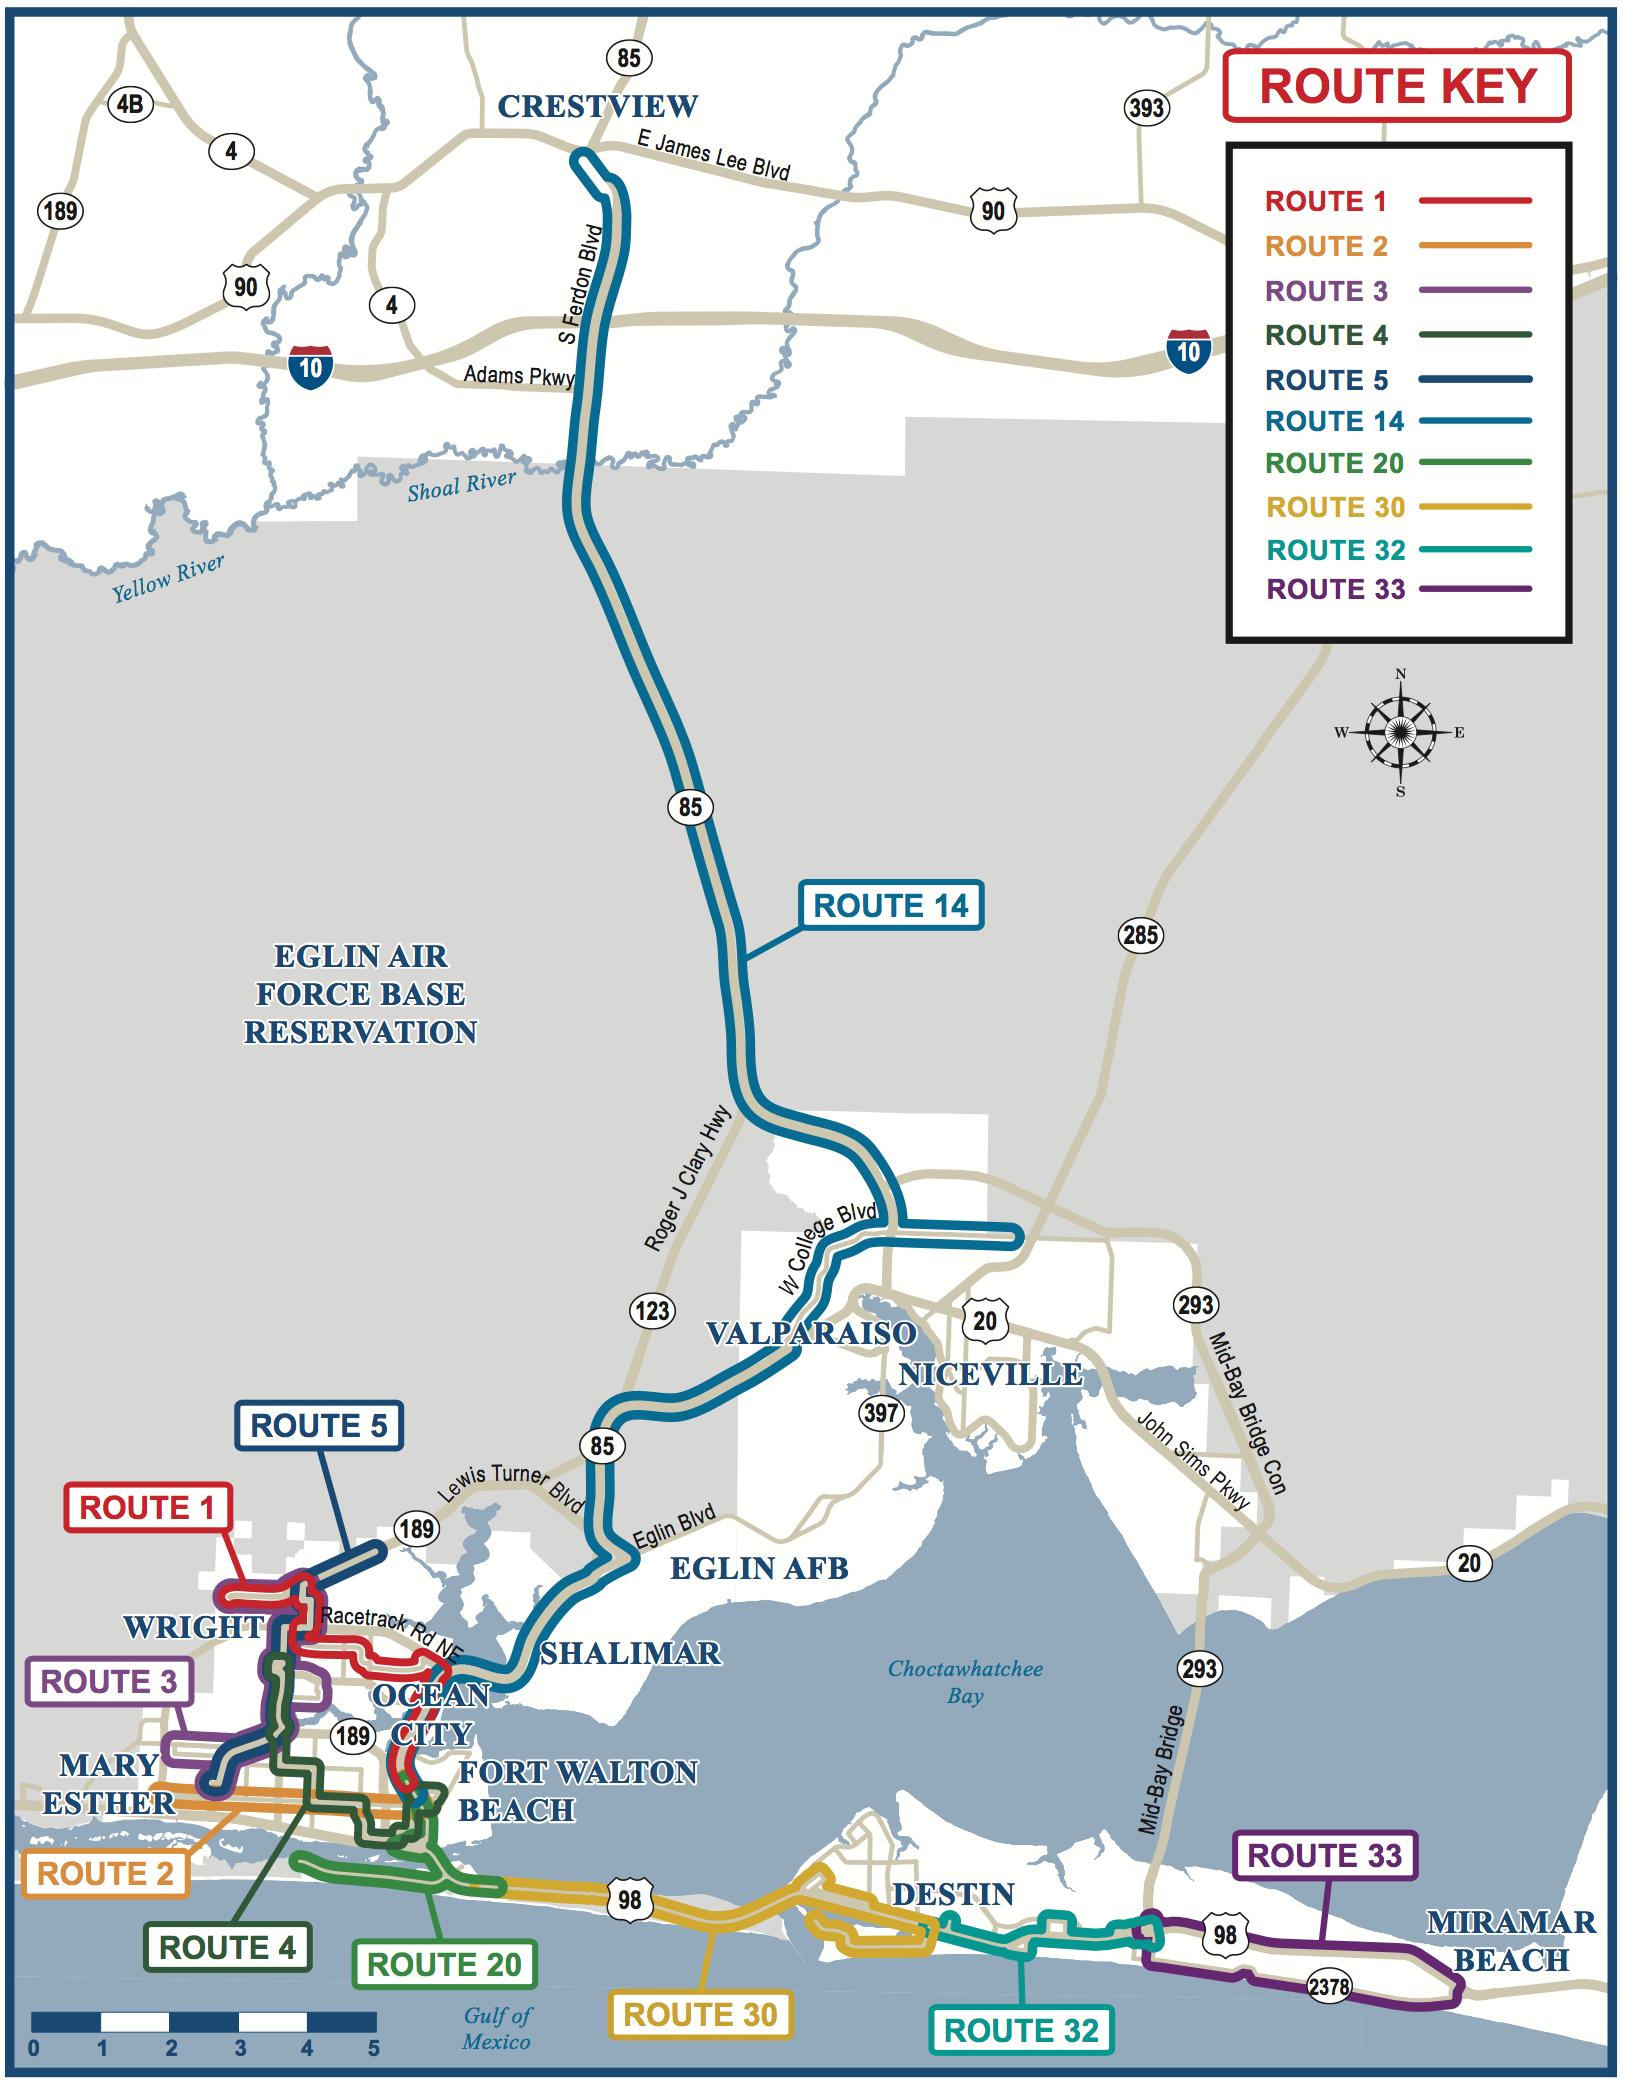 Fwb Wave Express Archives - Ec Rider - Niceville Florida Map